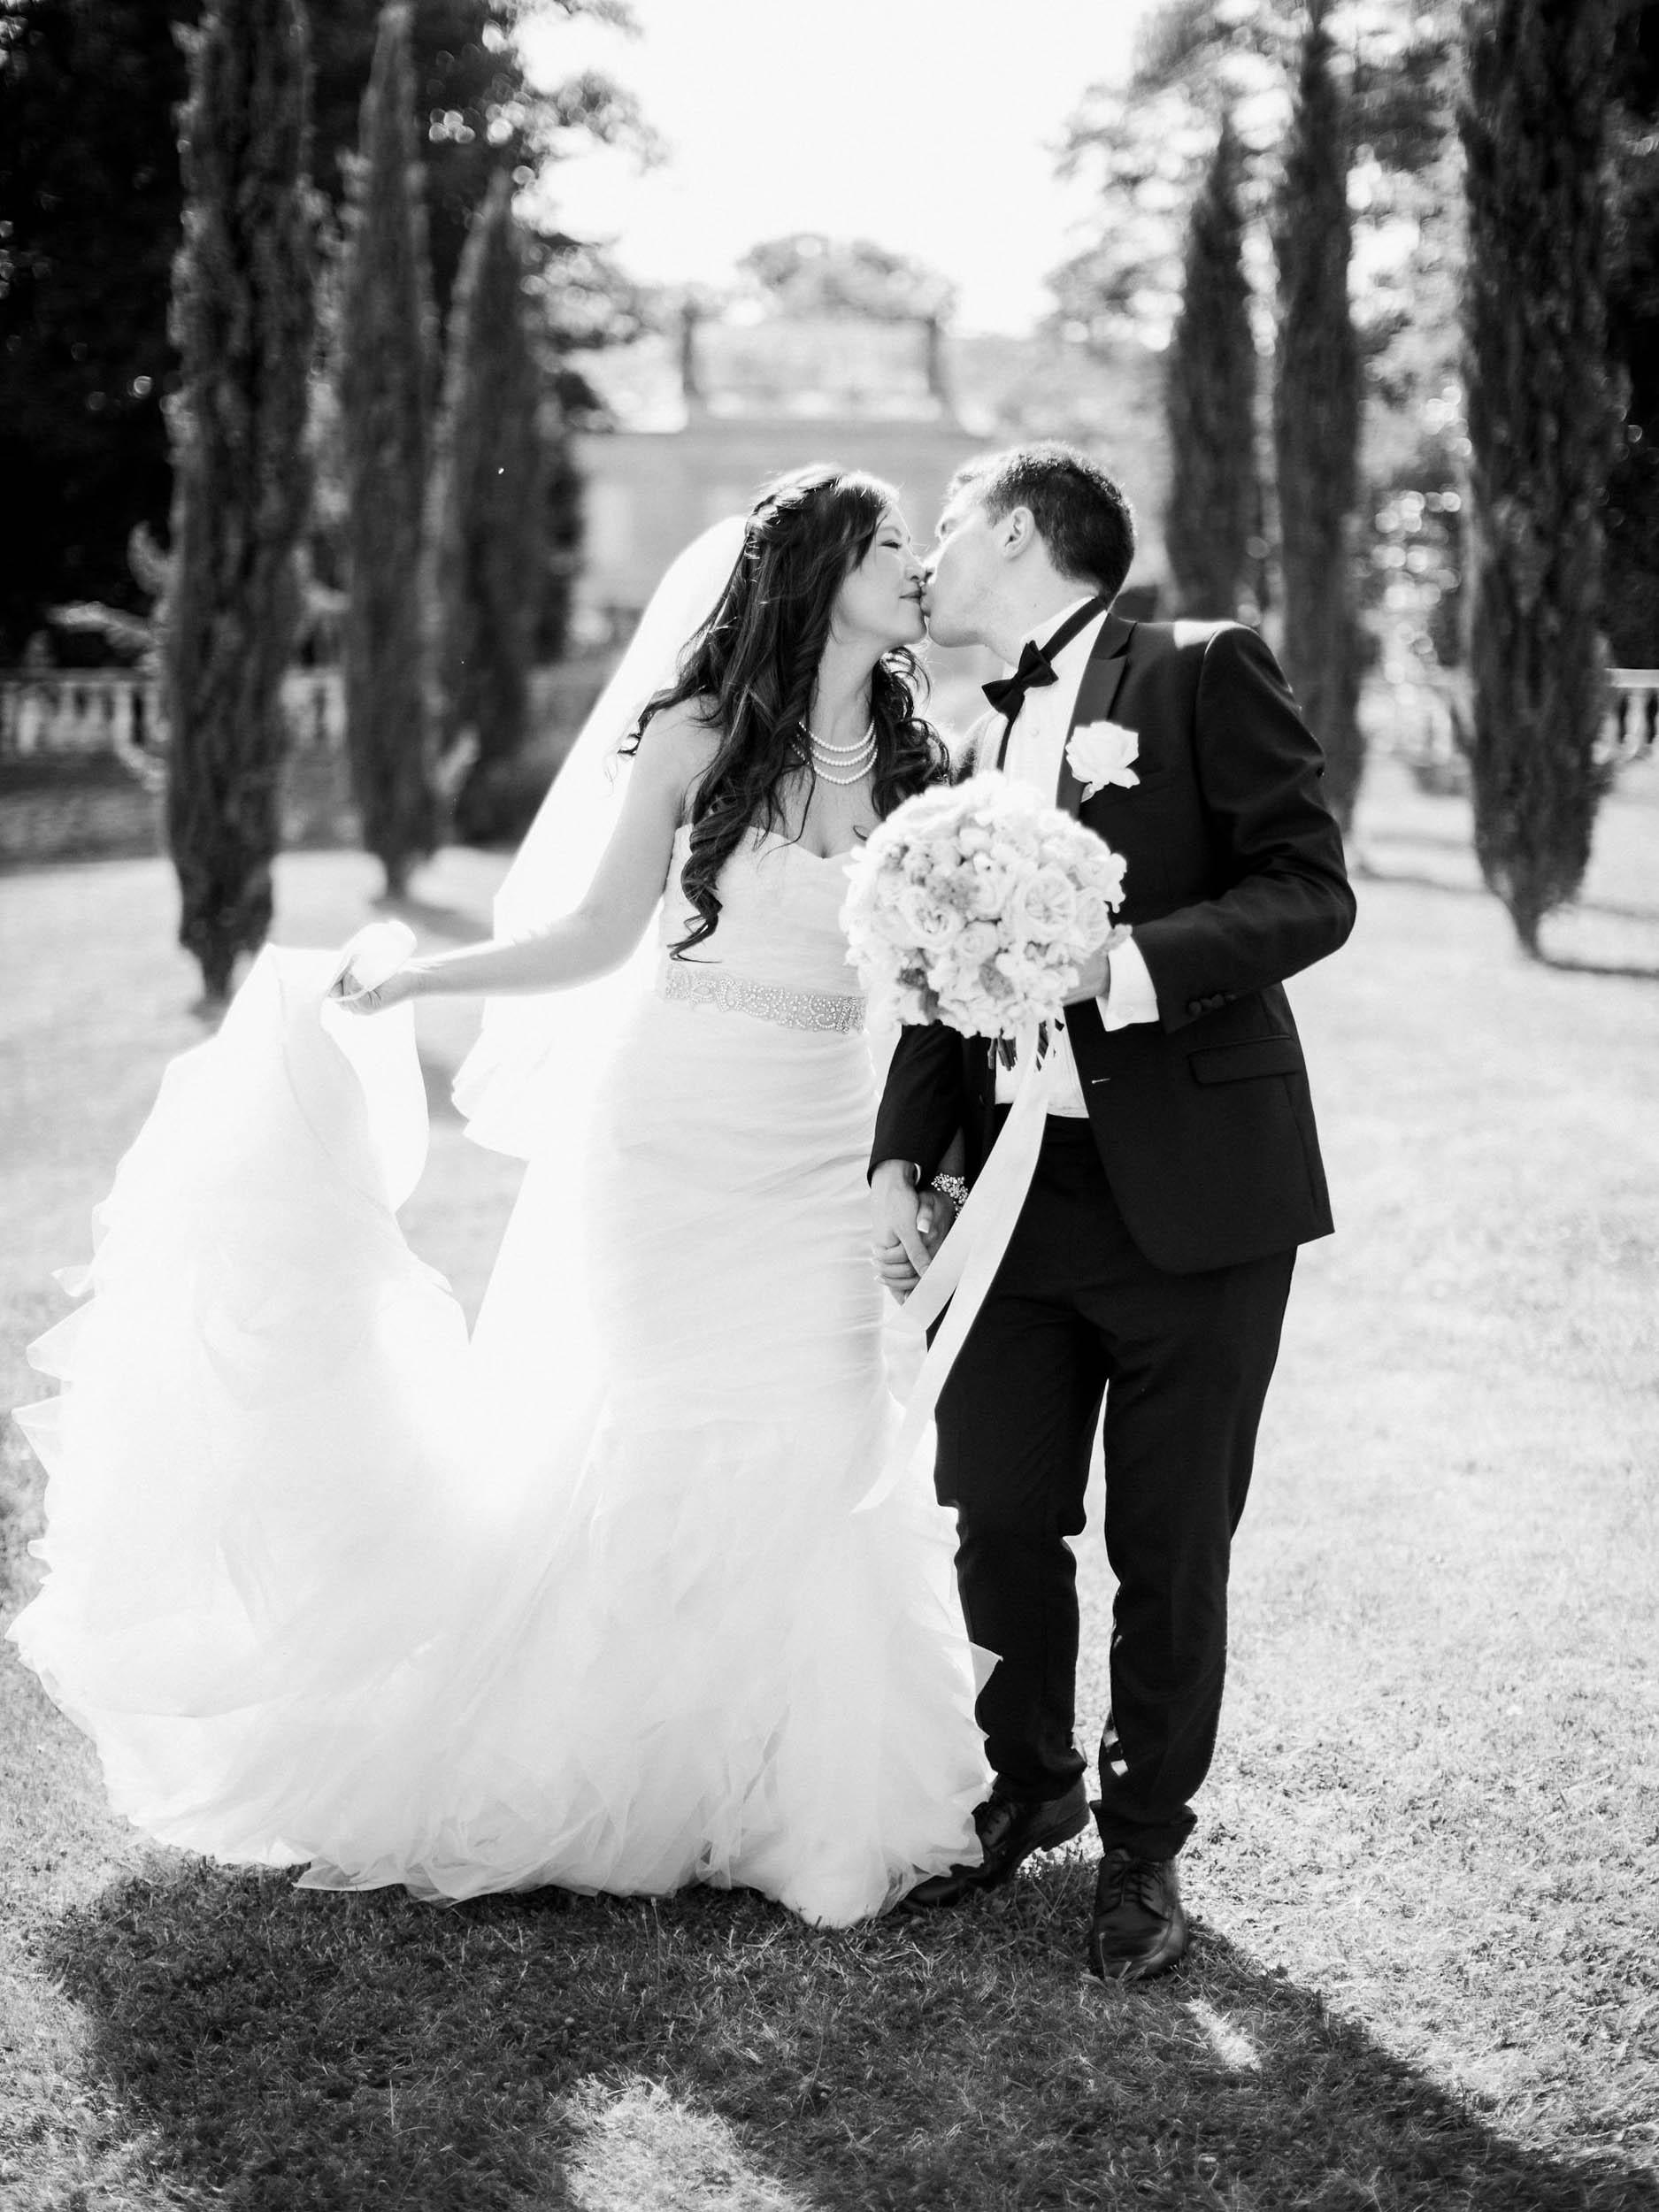 Amy O'Boyle Photography- Destination & UK Fine Art Film Wedding Photographer- Chateau La Durantie Wedding-33.jpg